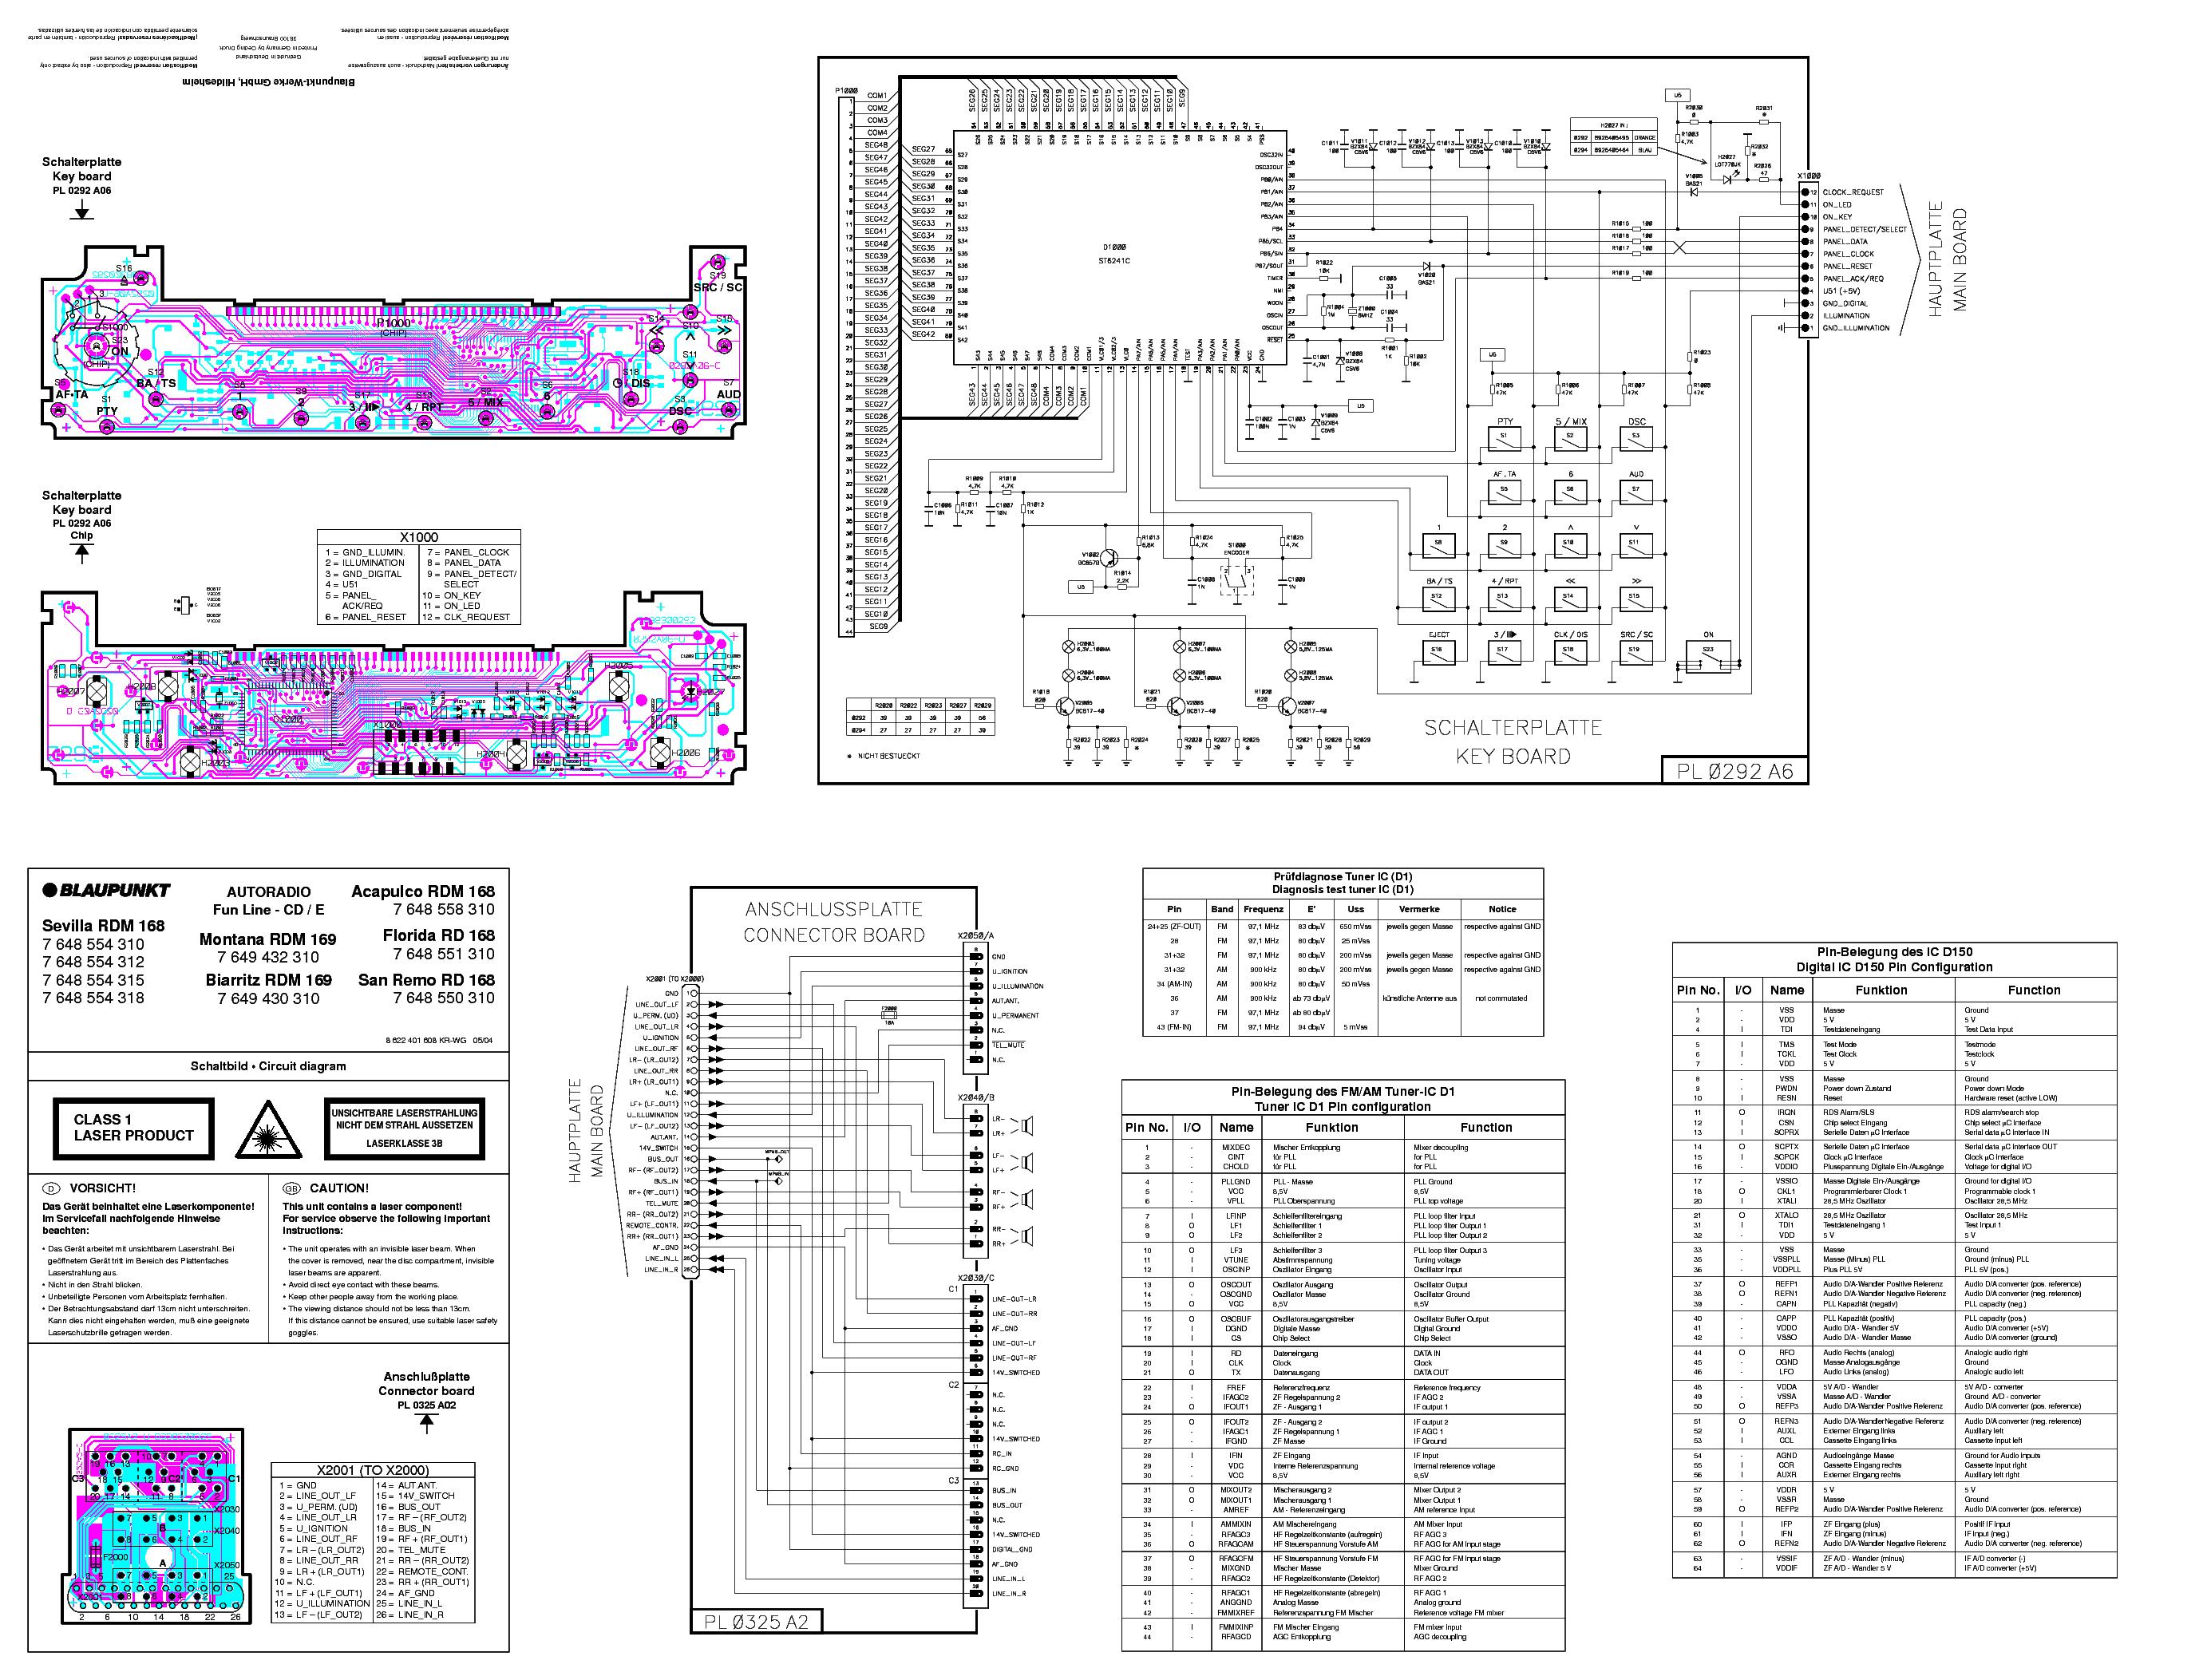 BLAUPUNKT FLORIDA RD-168 service manual (1st page)